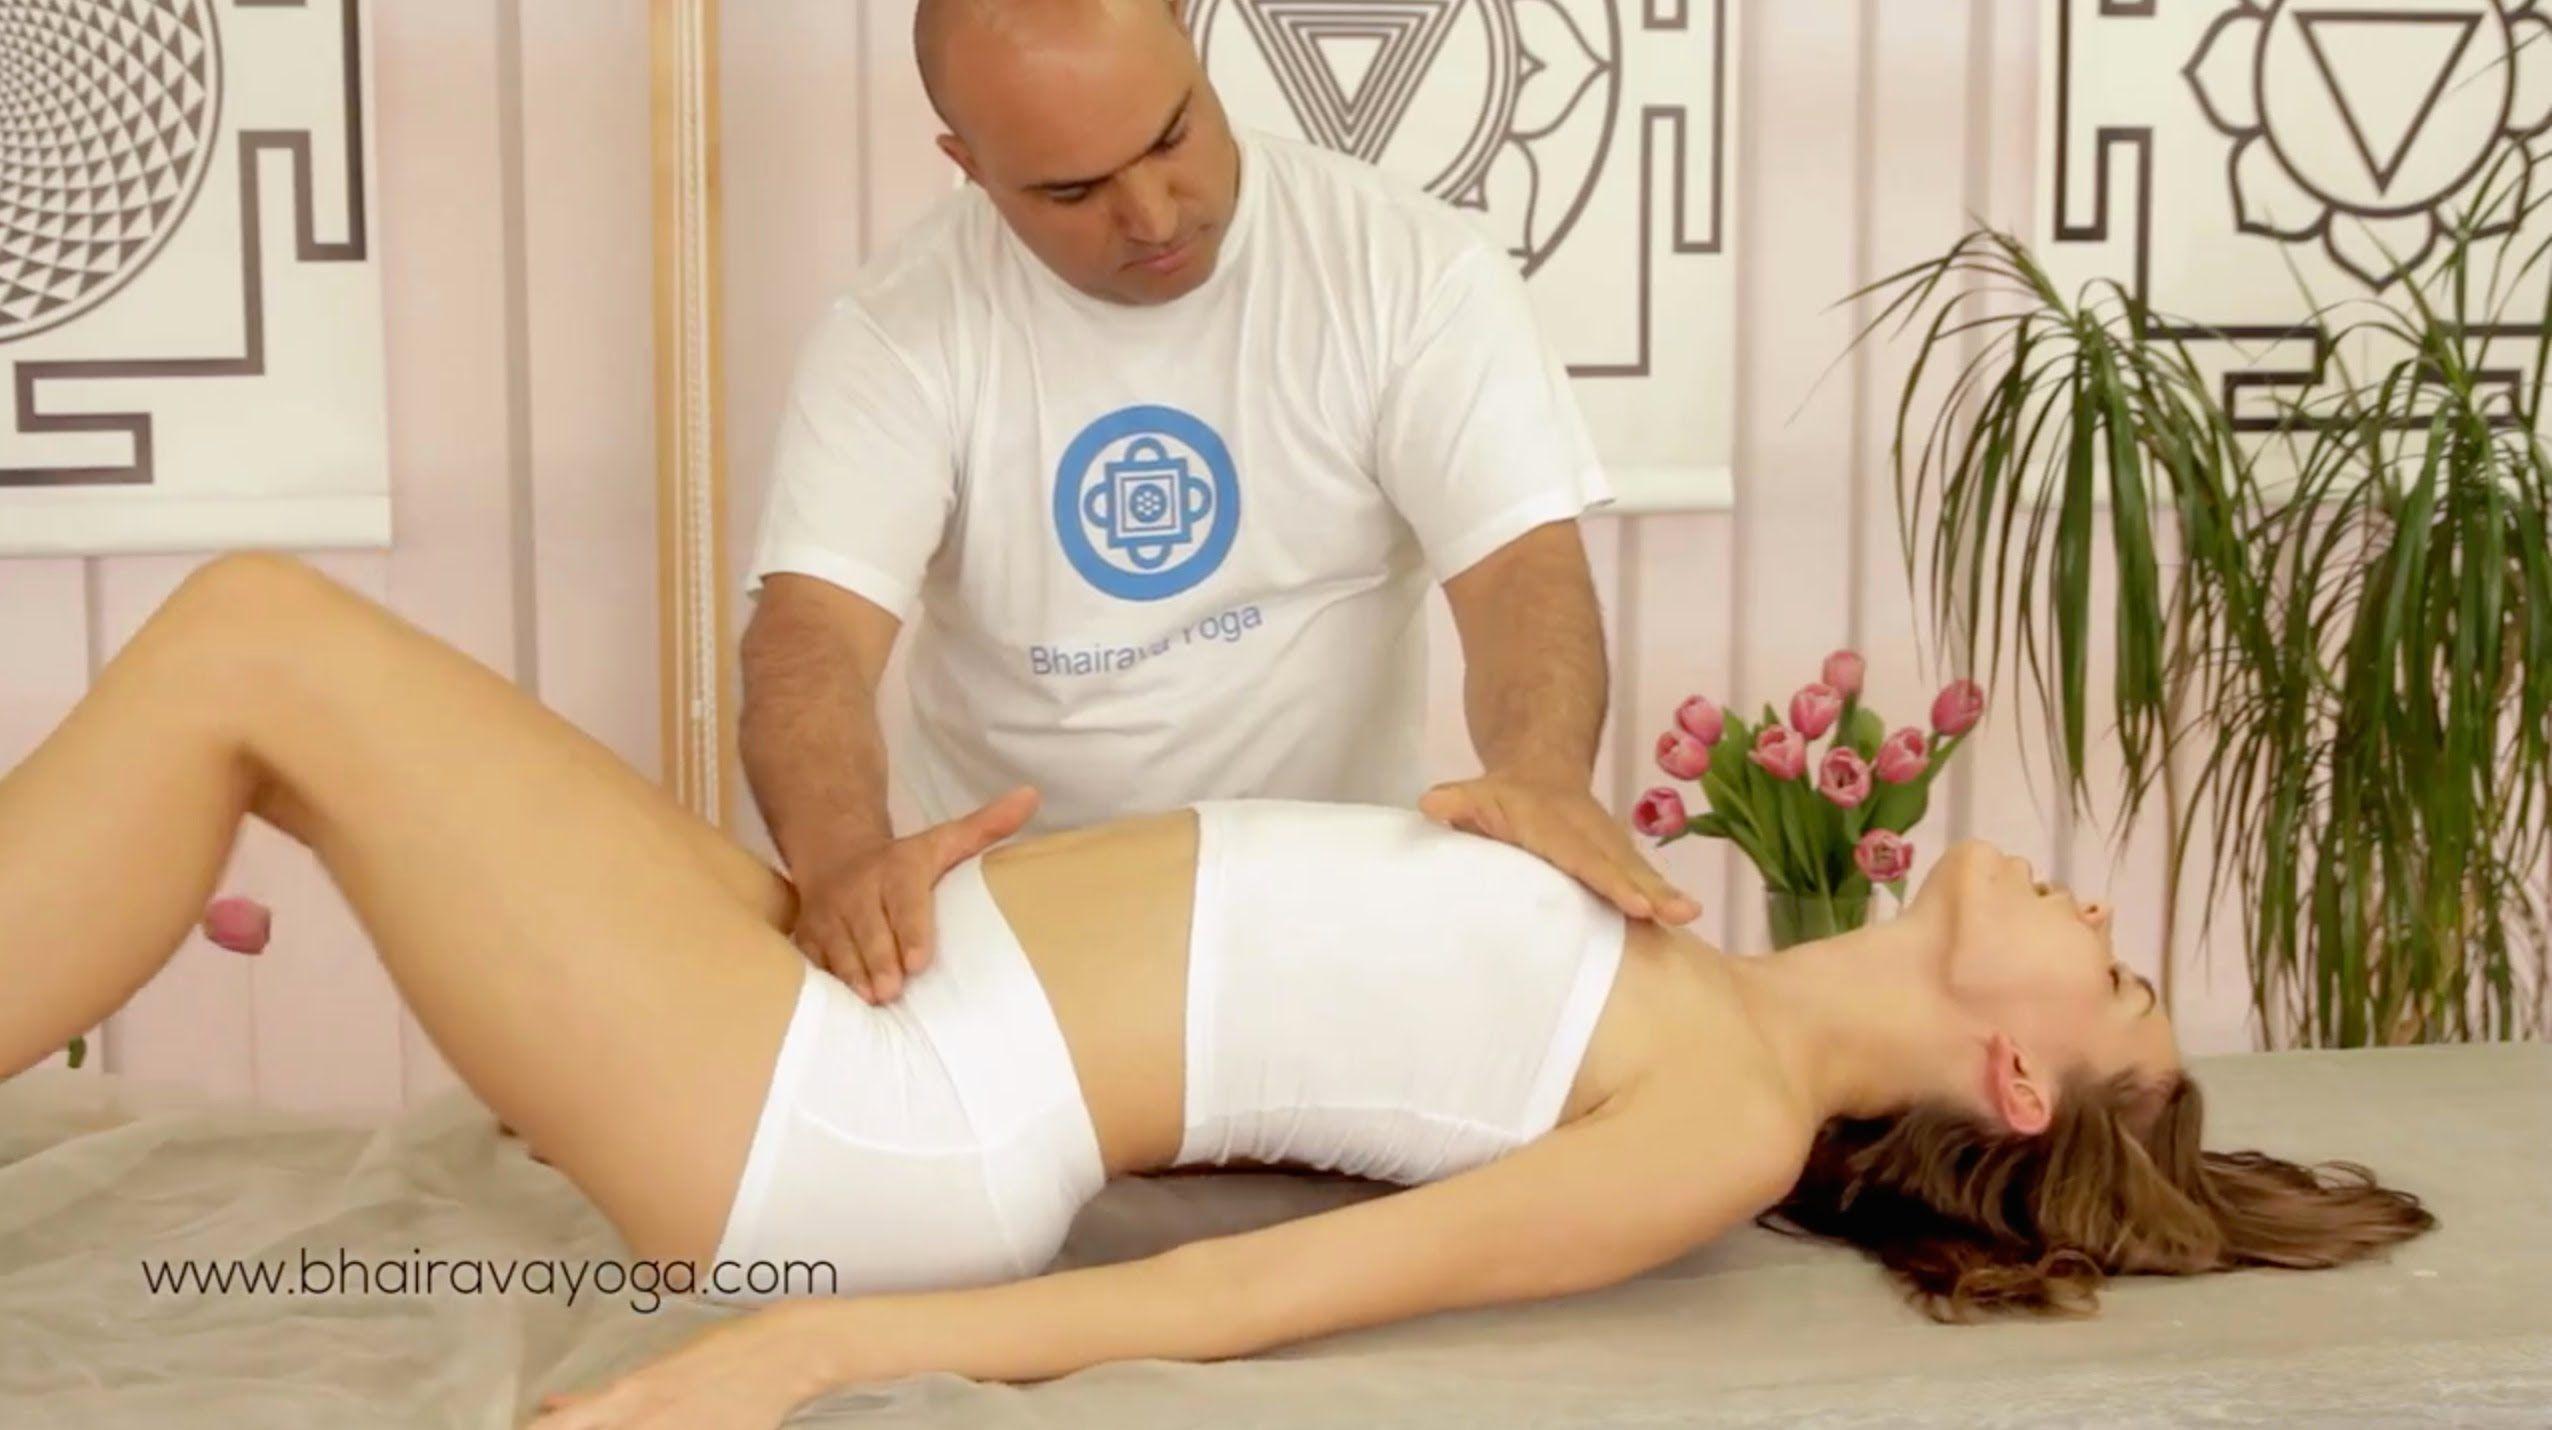 erotic massage in copenhagen side massage